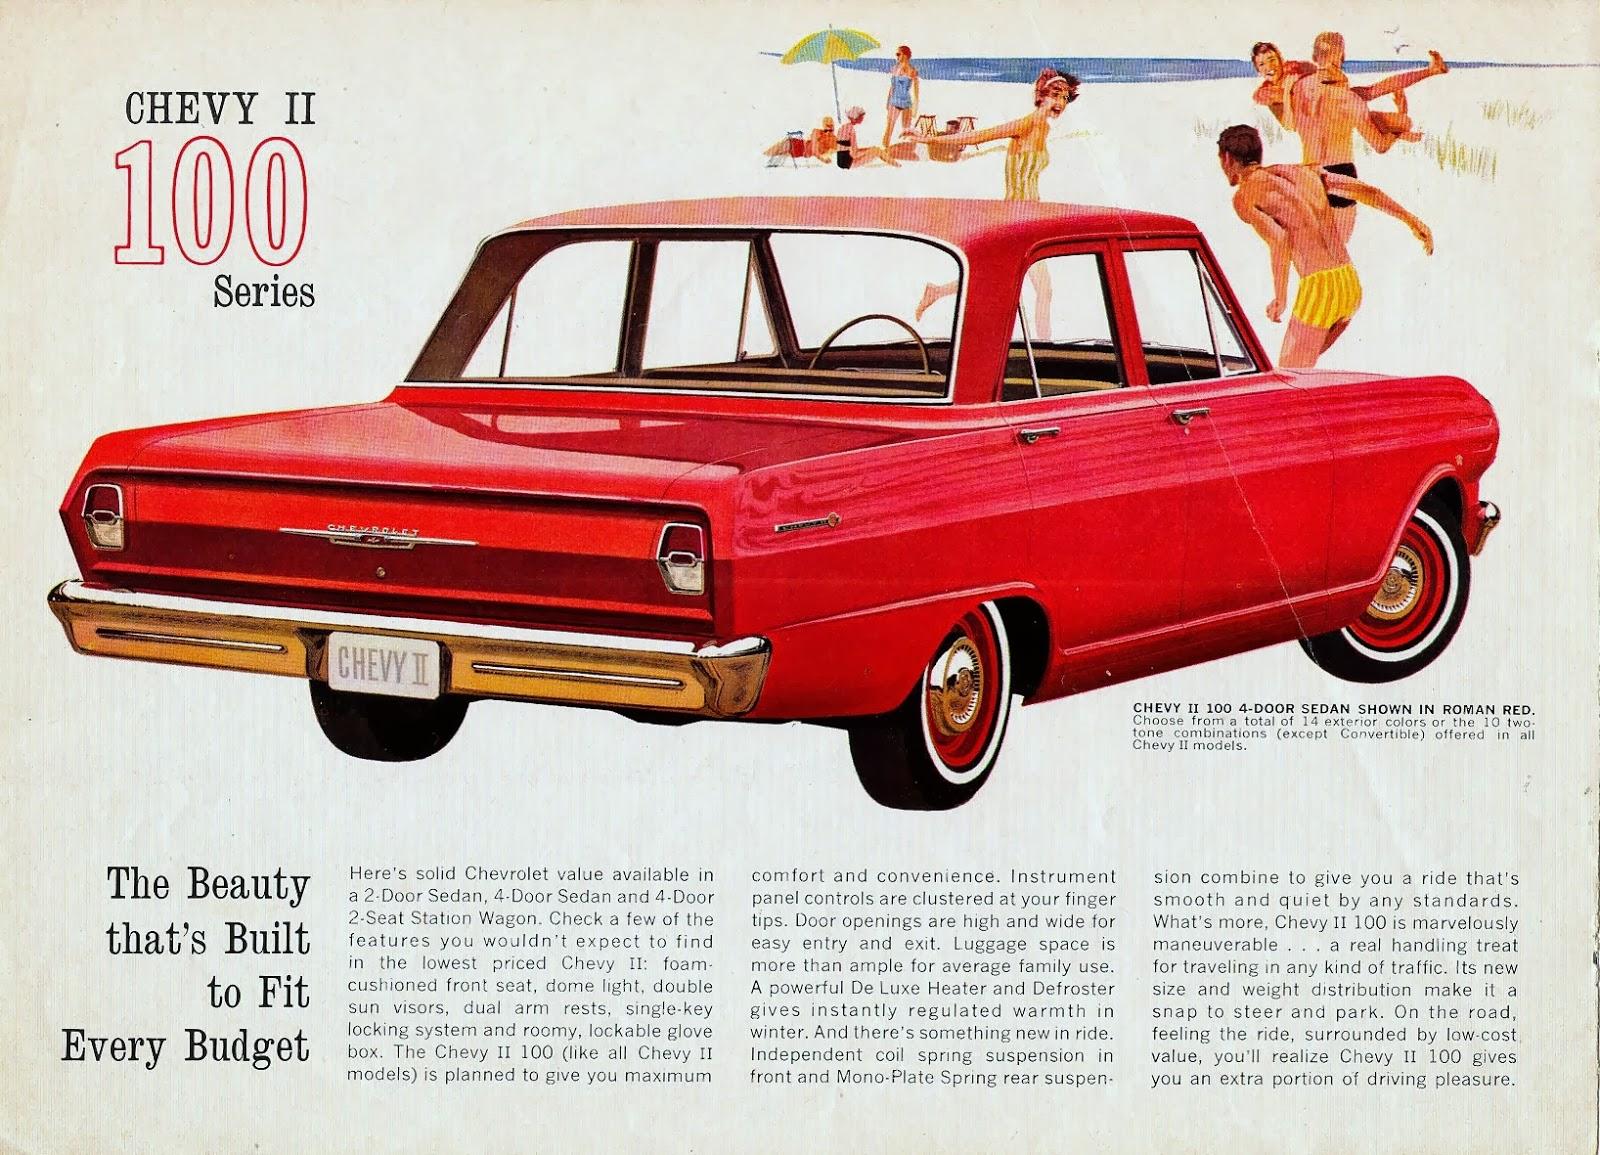 Miss Sews It All Serendipity 1960s American Cars Classic Car Fuse Box Sweet